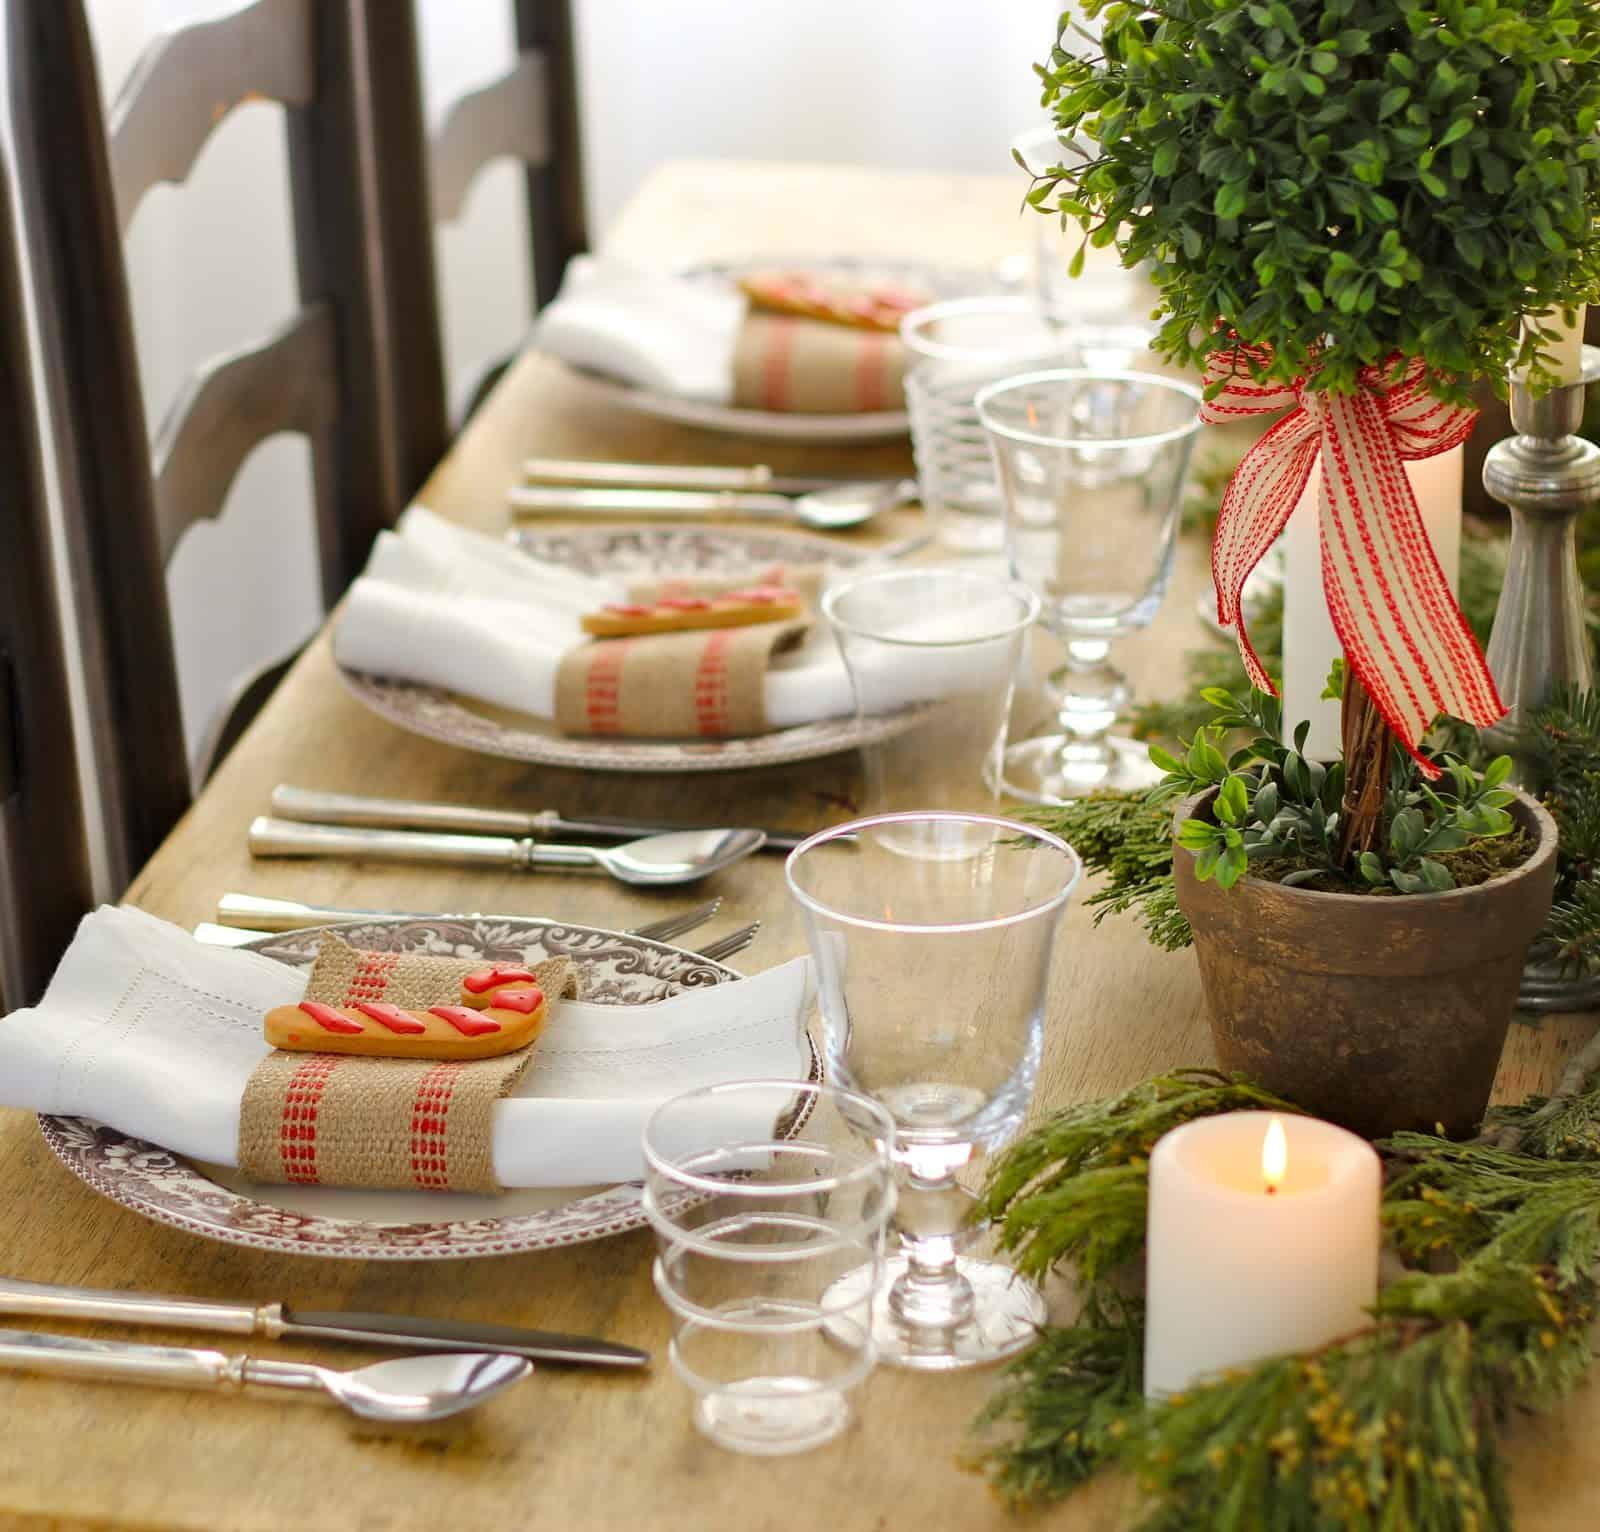 Miniature holiday trees and burlap napkin wraps